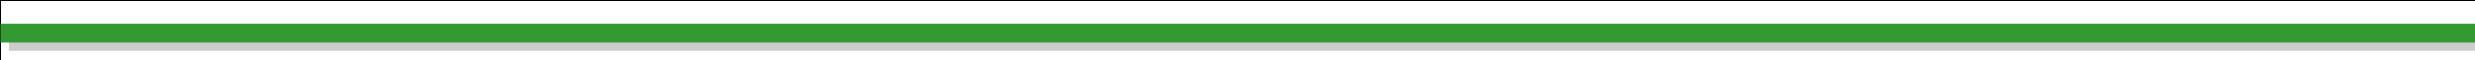 green-page-divider.jpg